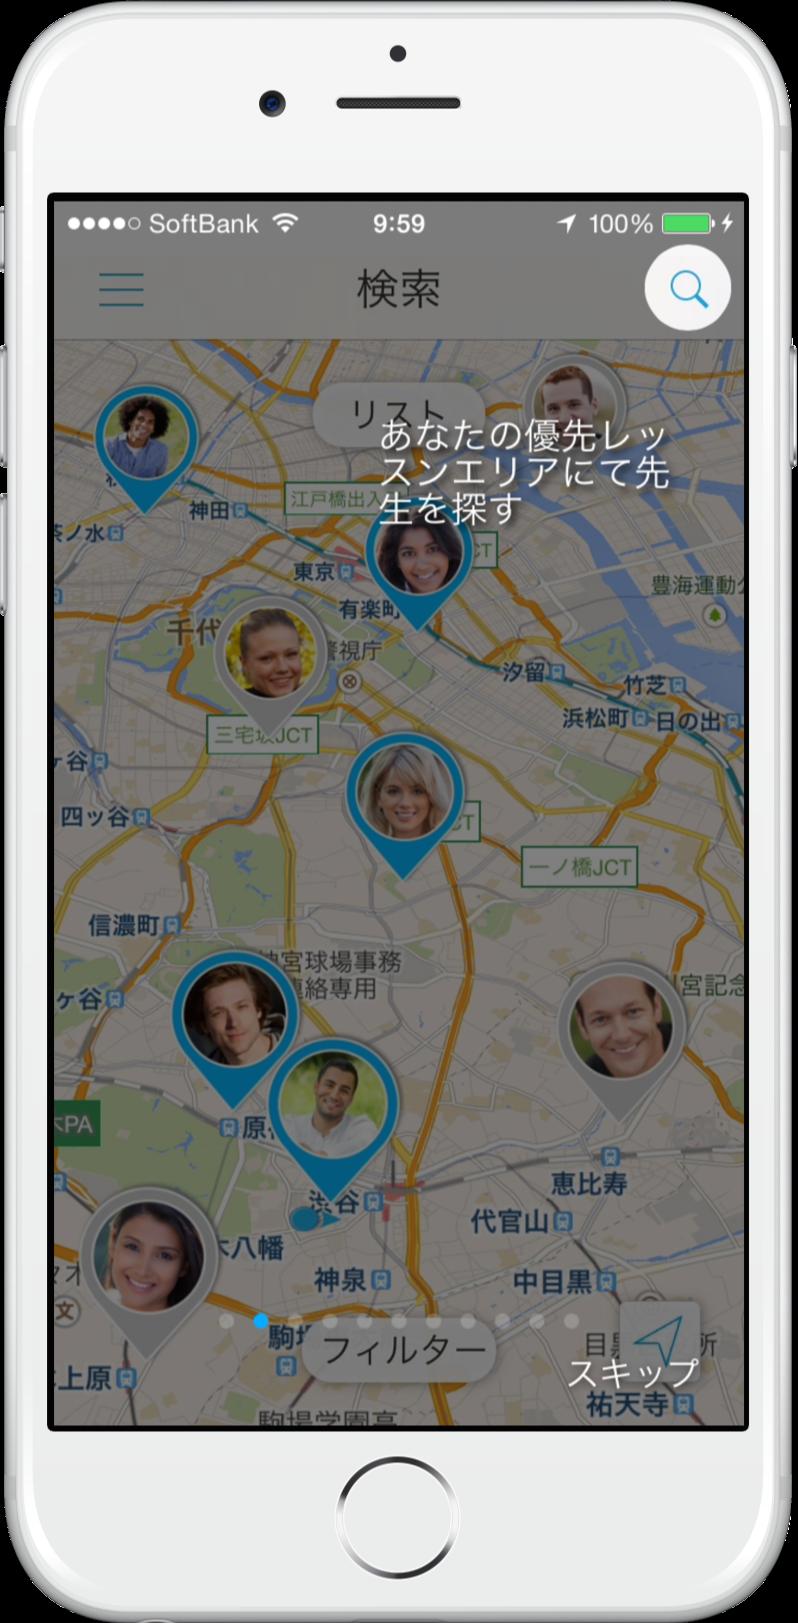 eikaiwaNOW - レッスンの流れ - JPN - 1_iphone6_silver_portrait.png